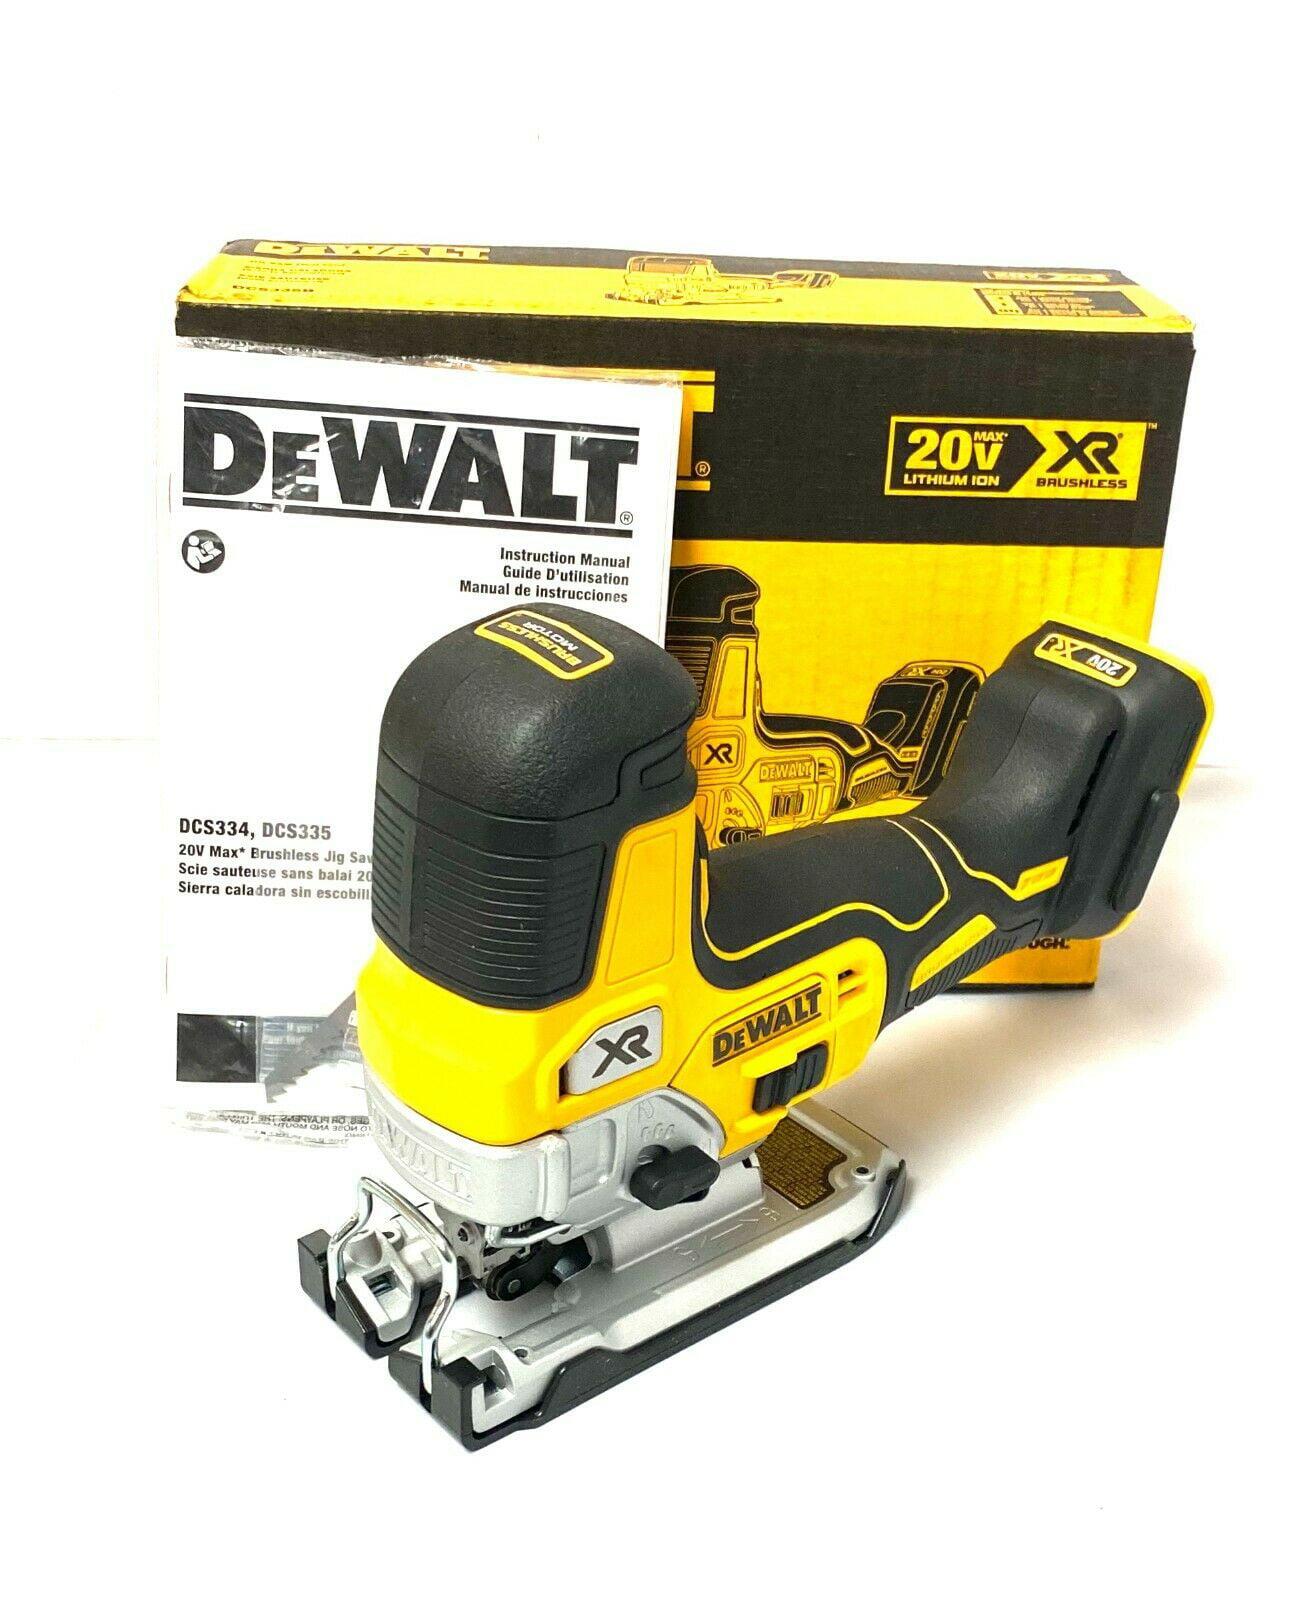 DeWalt DCS335 18V XR Brushless Grip Jigsaw with 20 Piece Wood /& Metal Blade Set